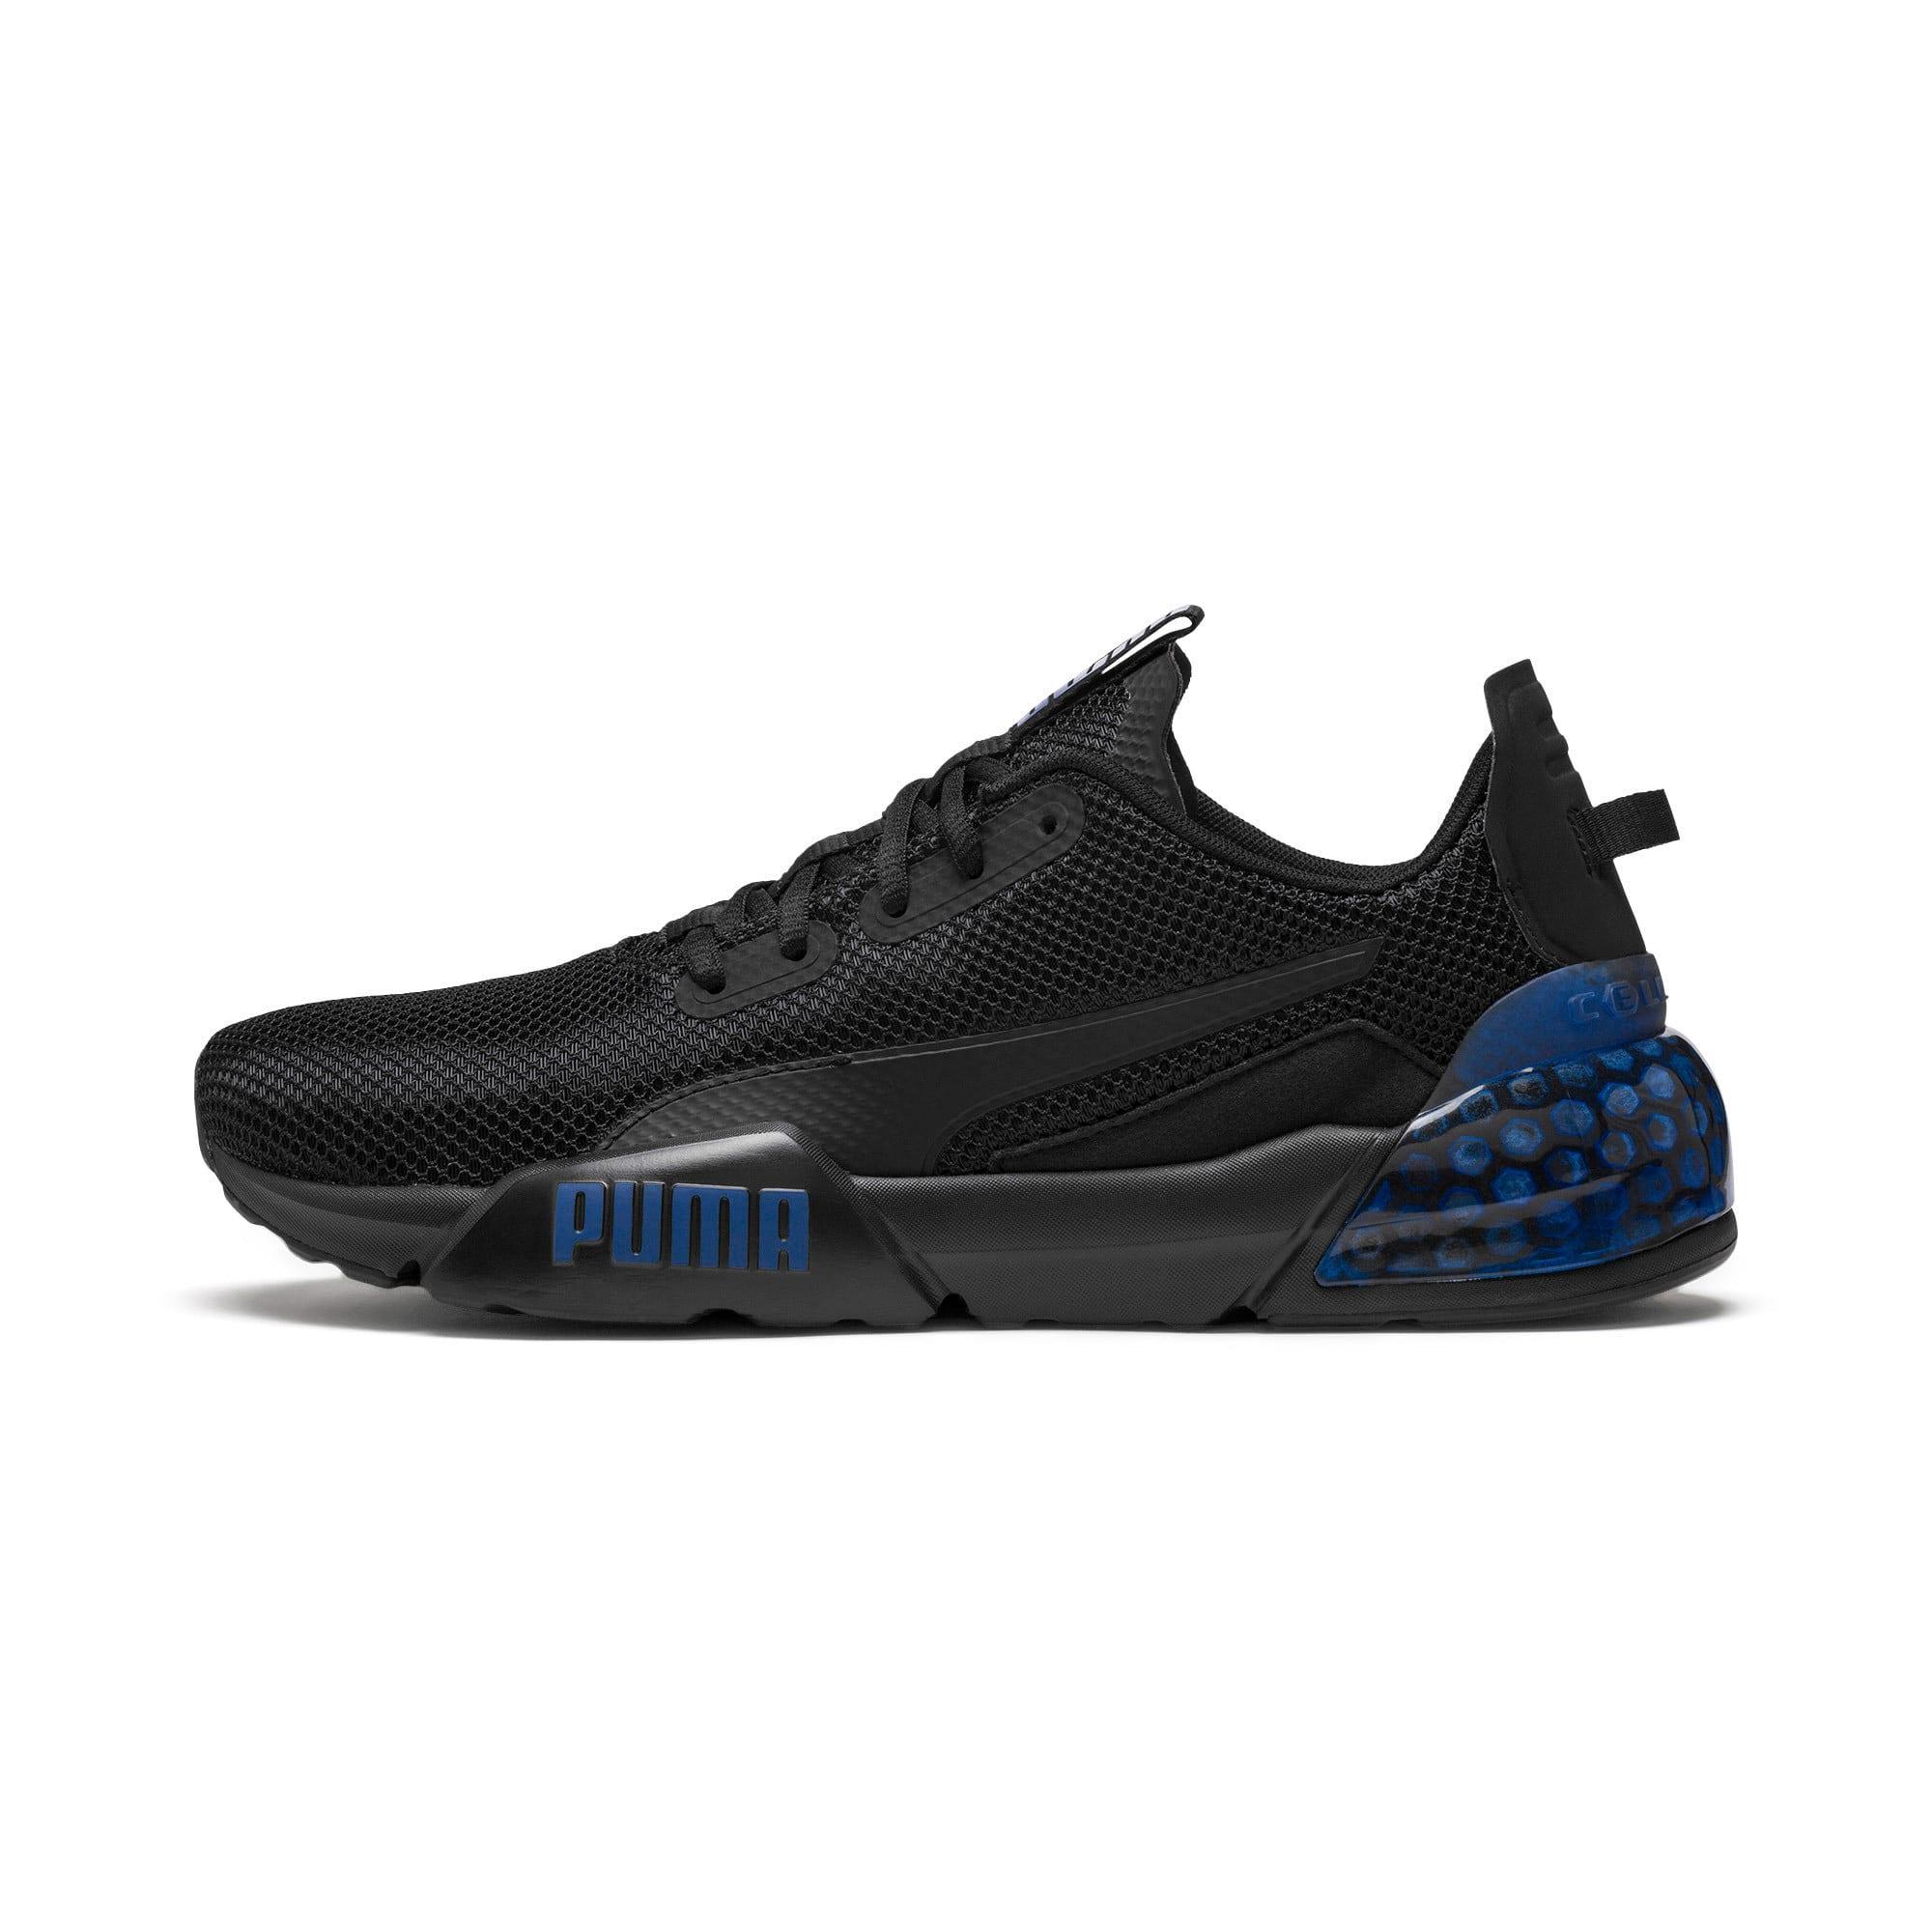 Thumbnail 1 of CELL Phase Men's Training Shoes, Puma Black-Galaxy Blue, medium